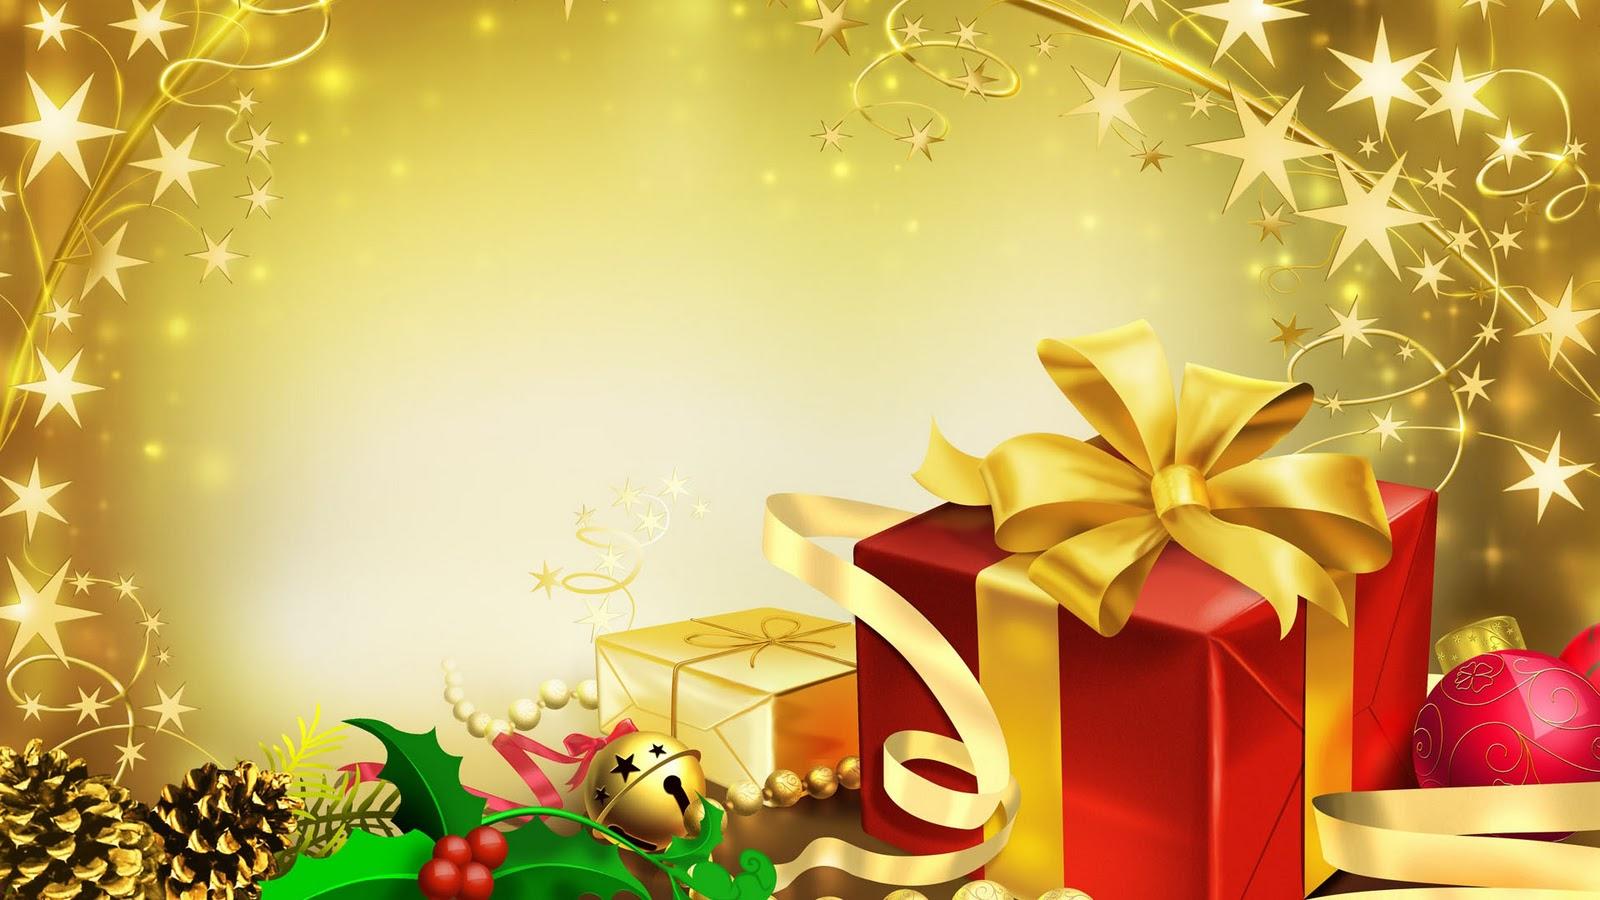 http://2.bp.blogspot.com/-WEQVUxZjfmY/Tqq7OzRfR7I/AAAAAAAAO9E/i2GLW0snH_4/s1600/Mooie-kerst-achtergronden-leuke-hd-kerst-wallpapers-afbeelding-plaatje-foto-1.jpg